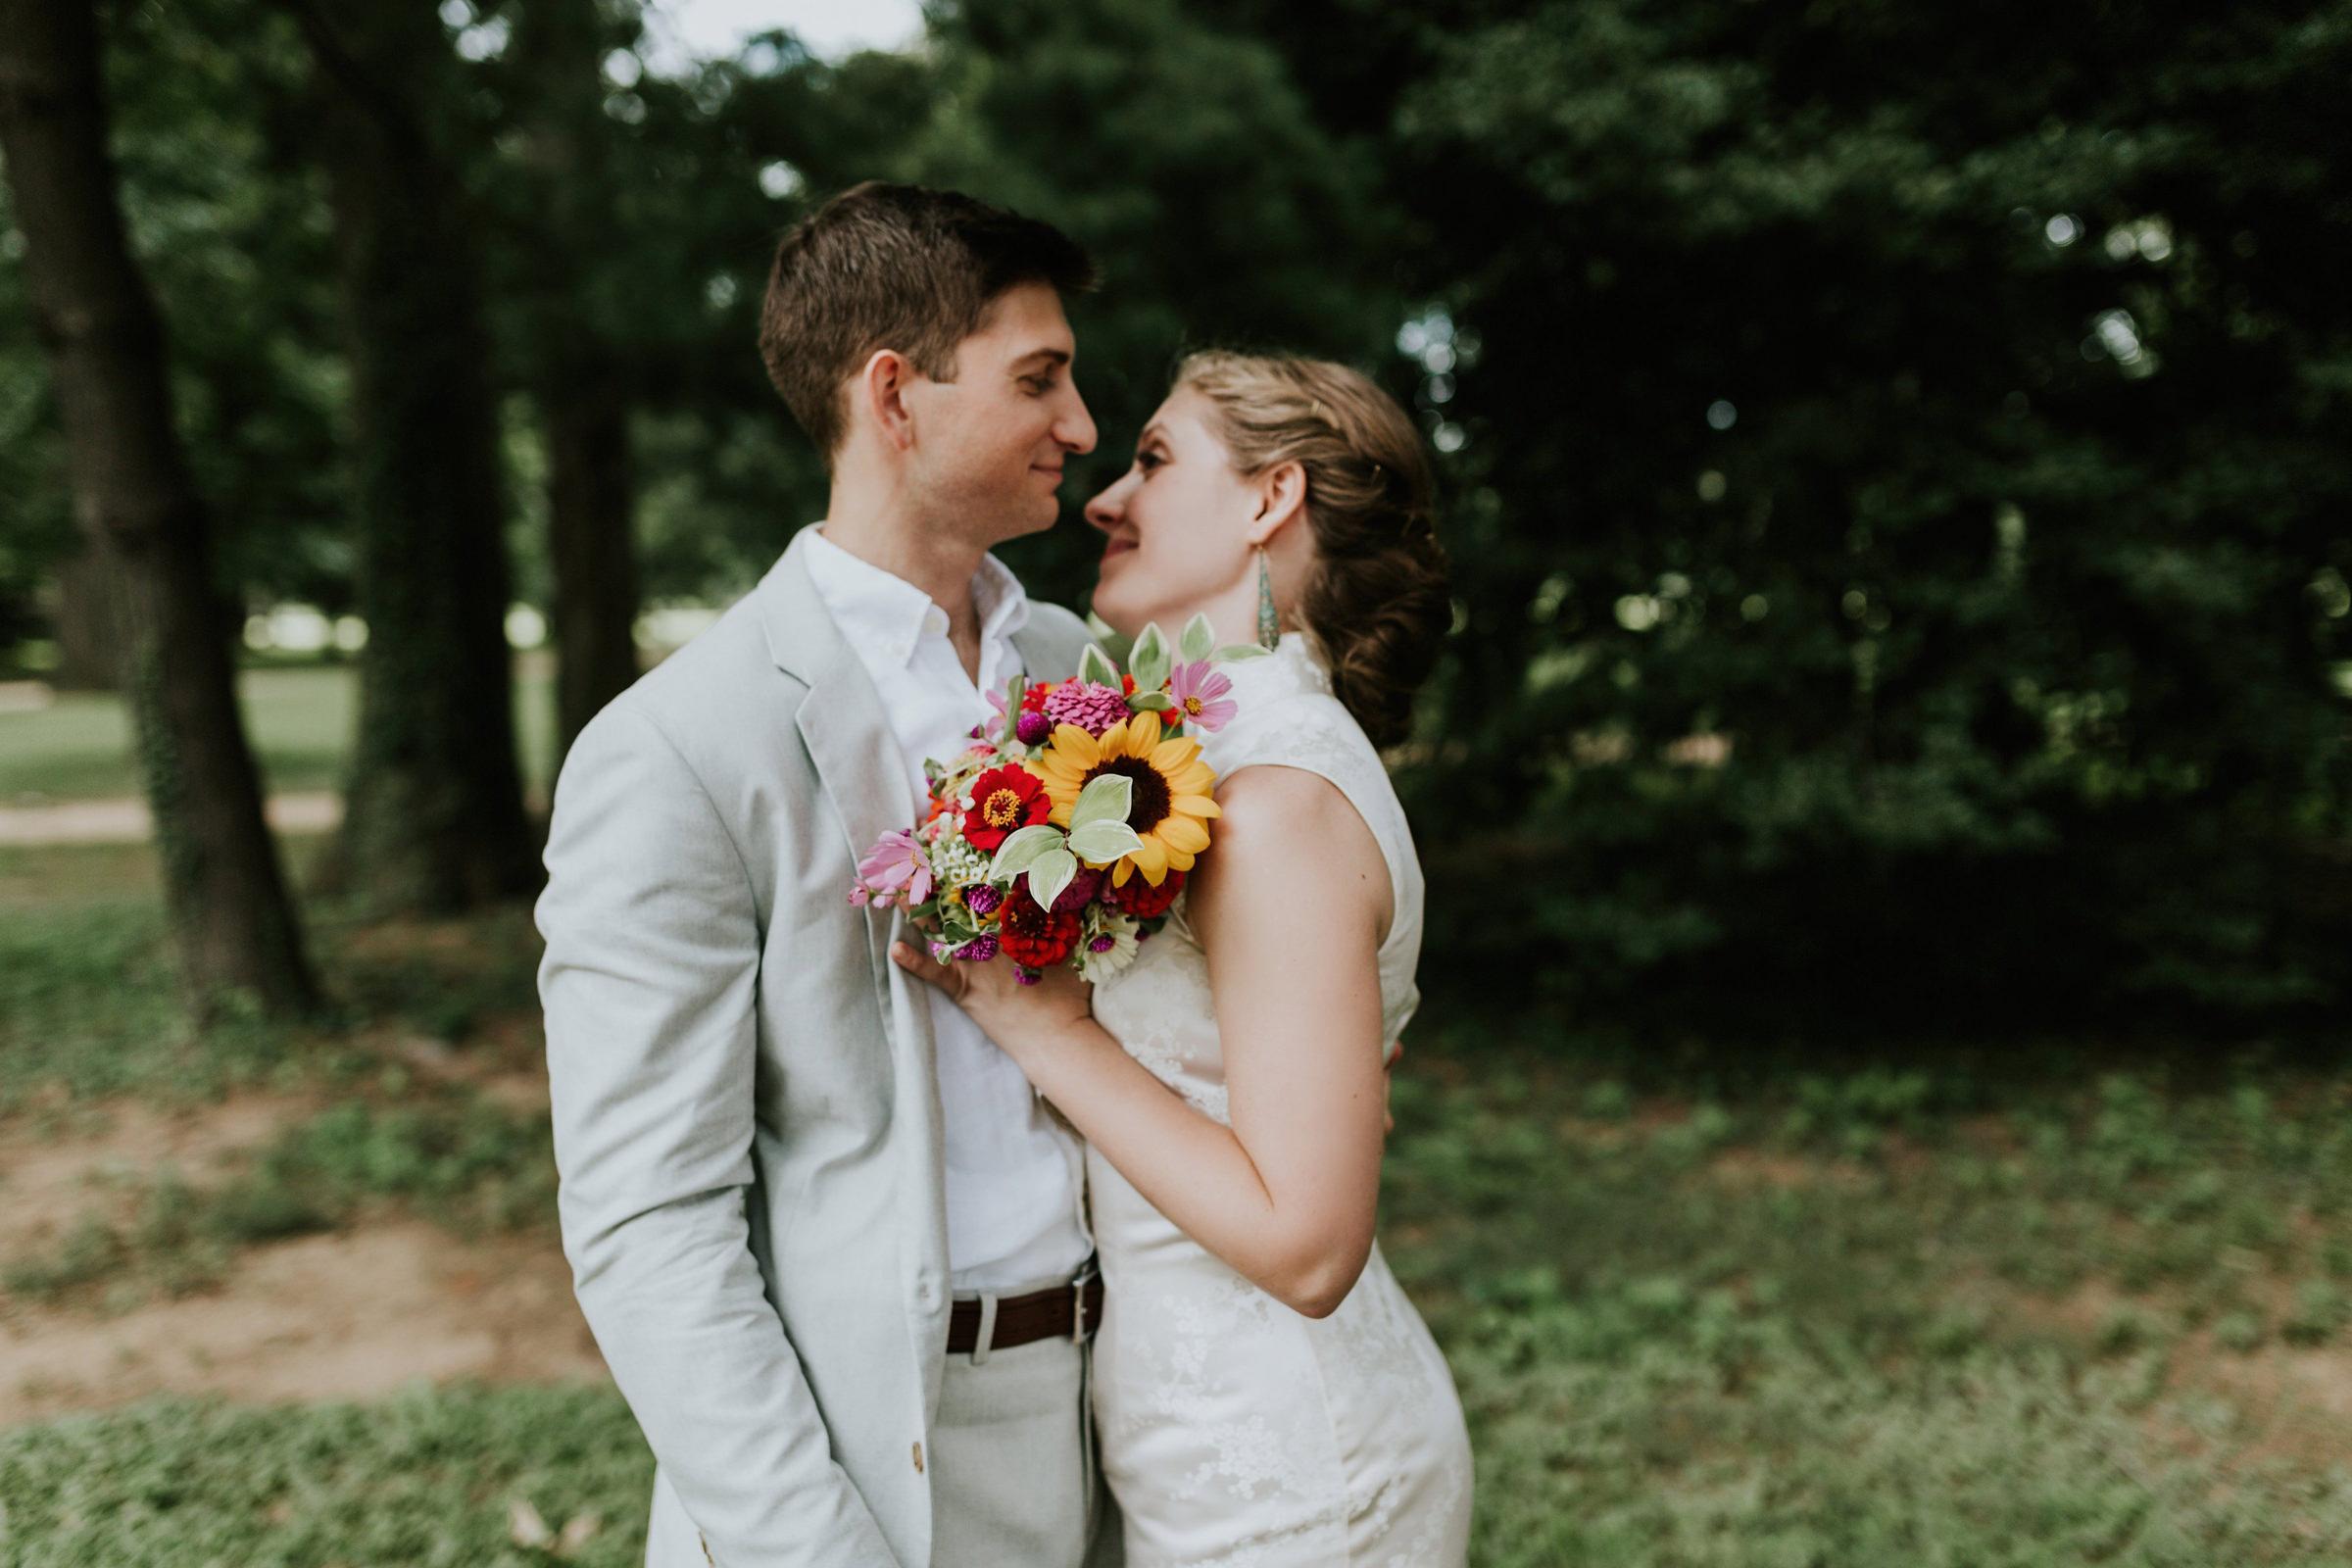 Kentucky_Candid_Wedding_Photographer_166.jpg